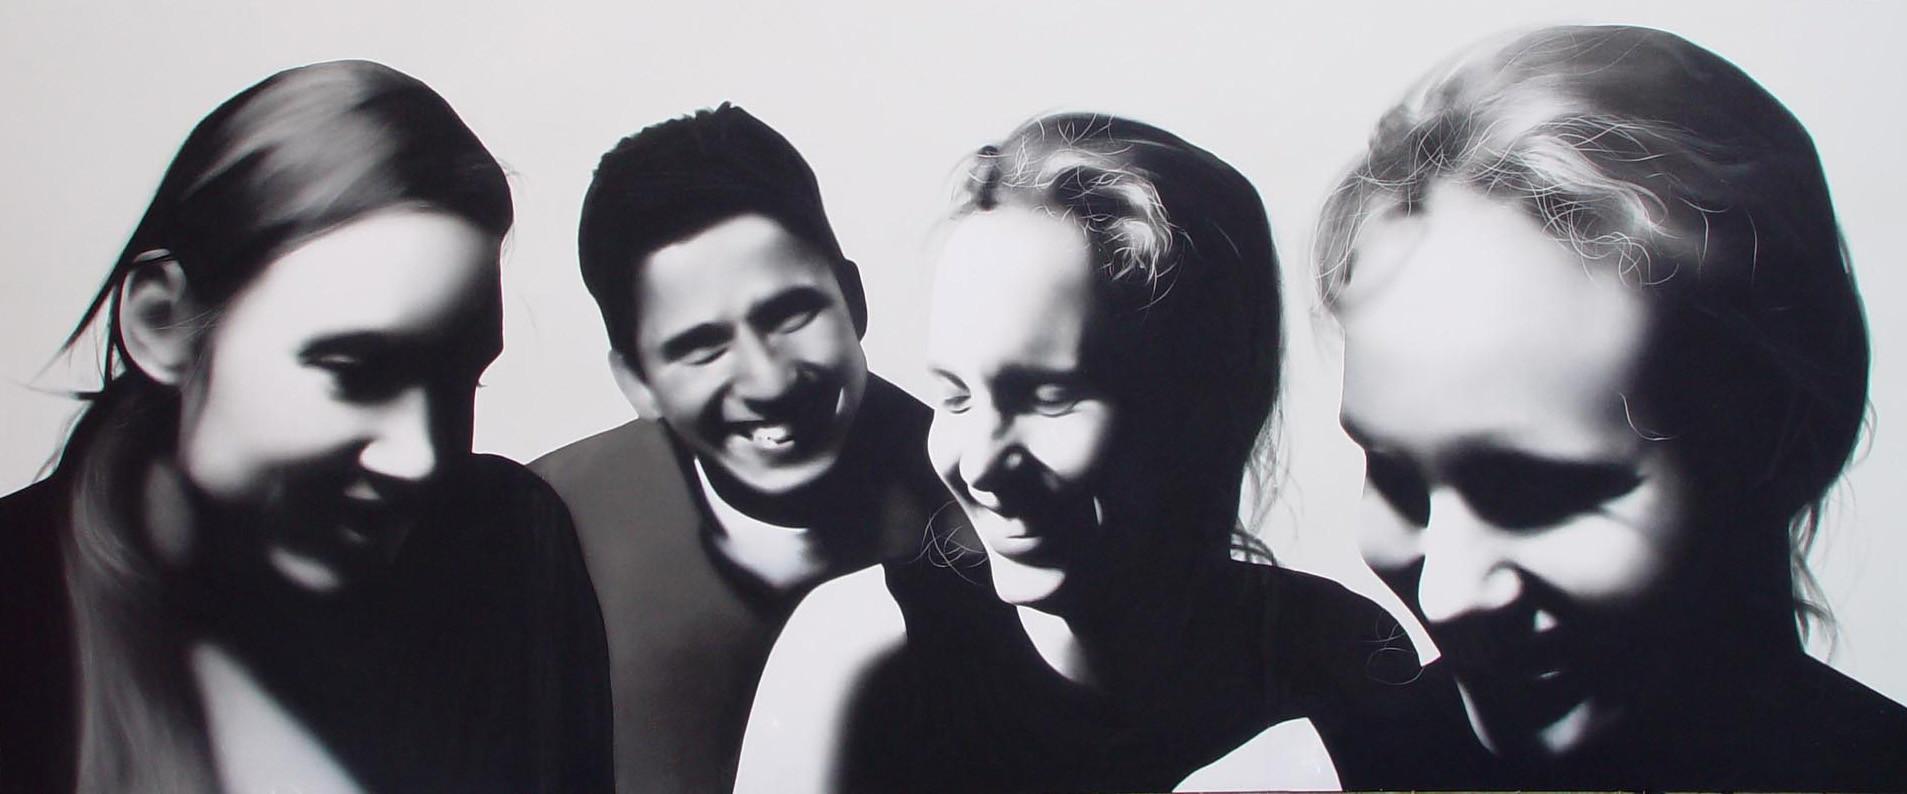 Self-Portrait juxtaposed with Rob, Sarah and Sarah